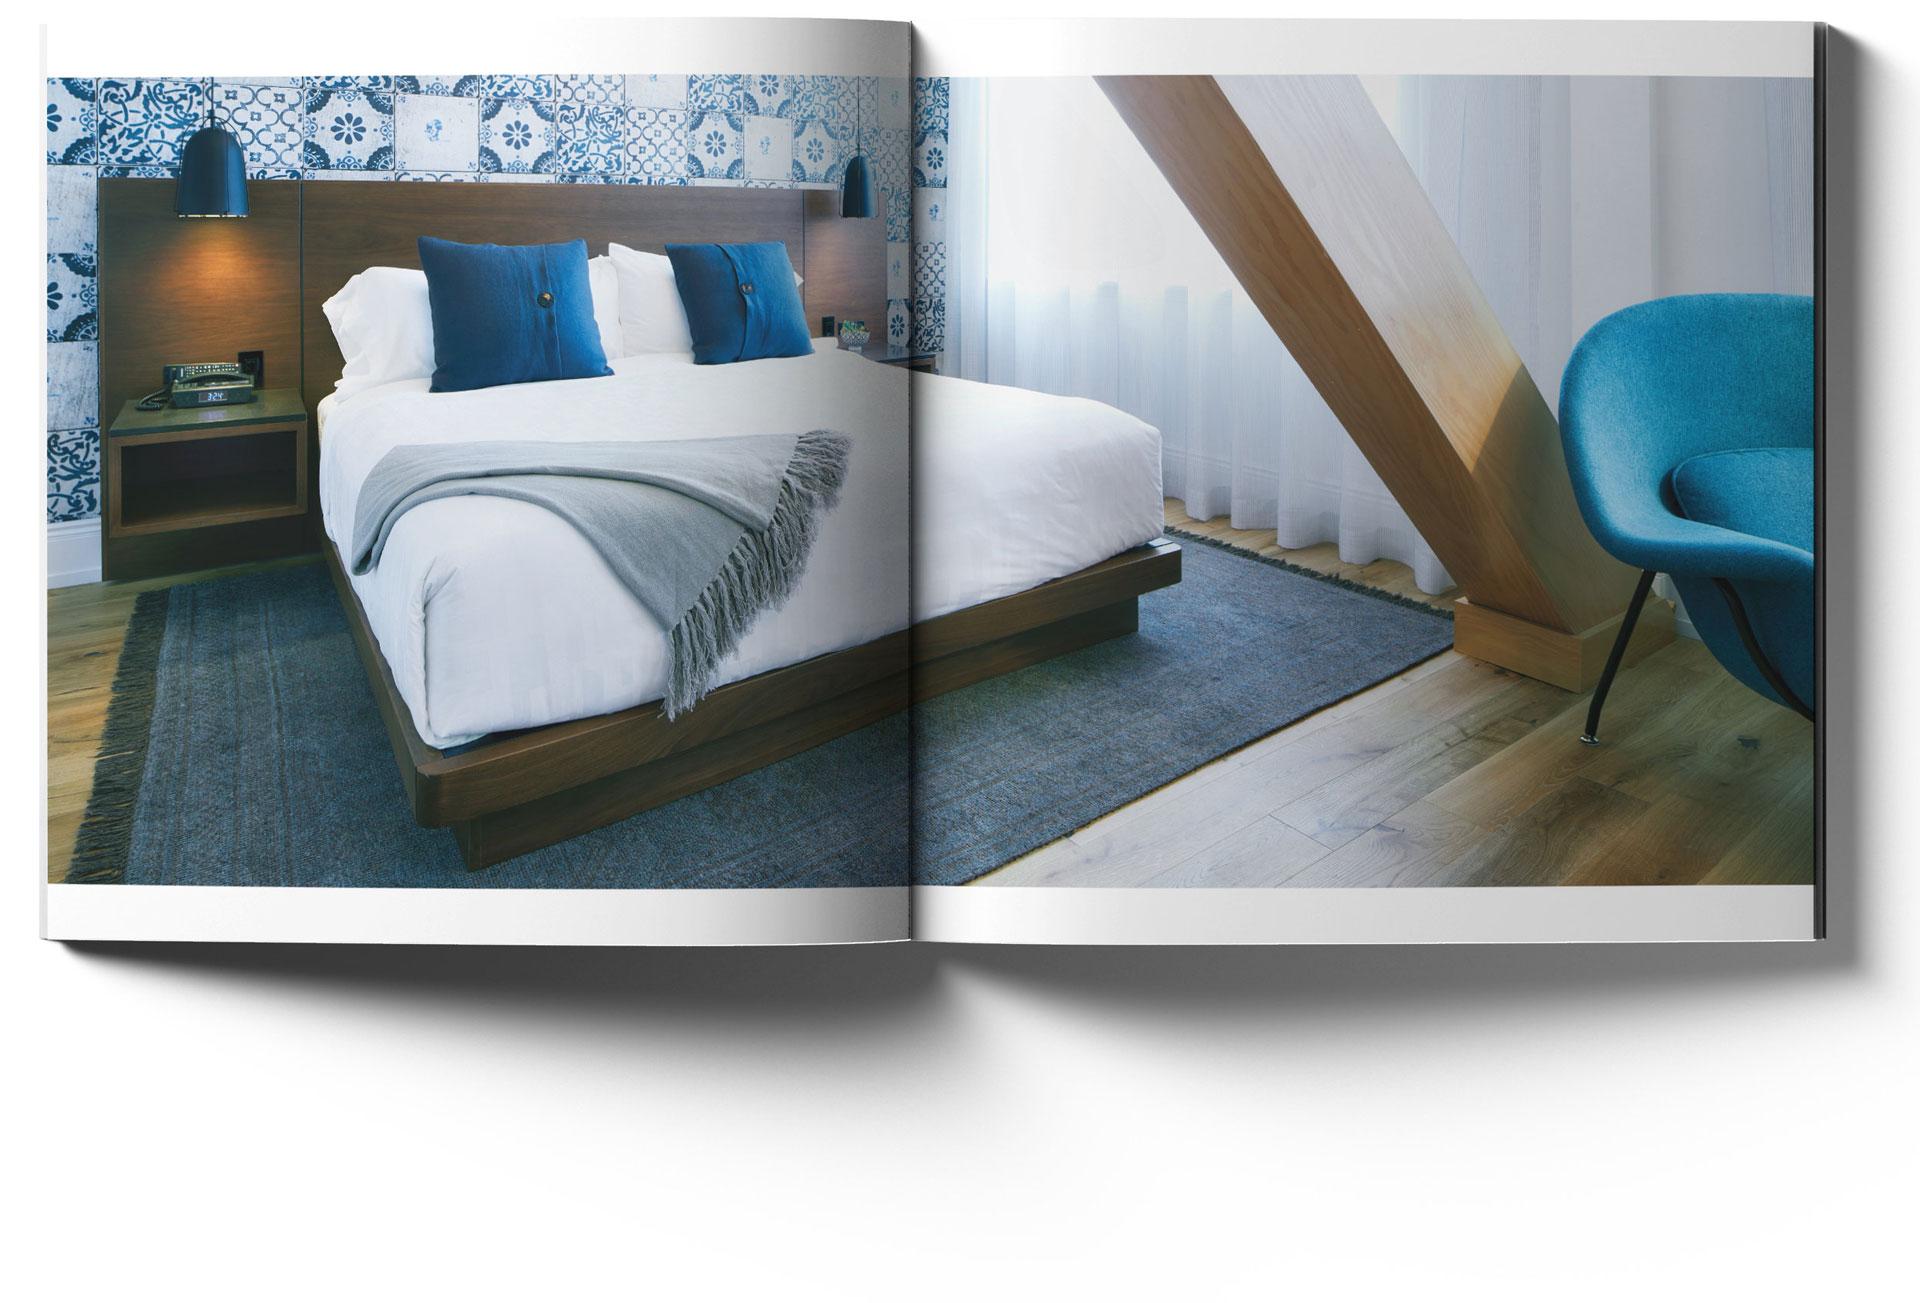 Walper Hotel look book spread